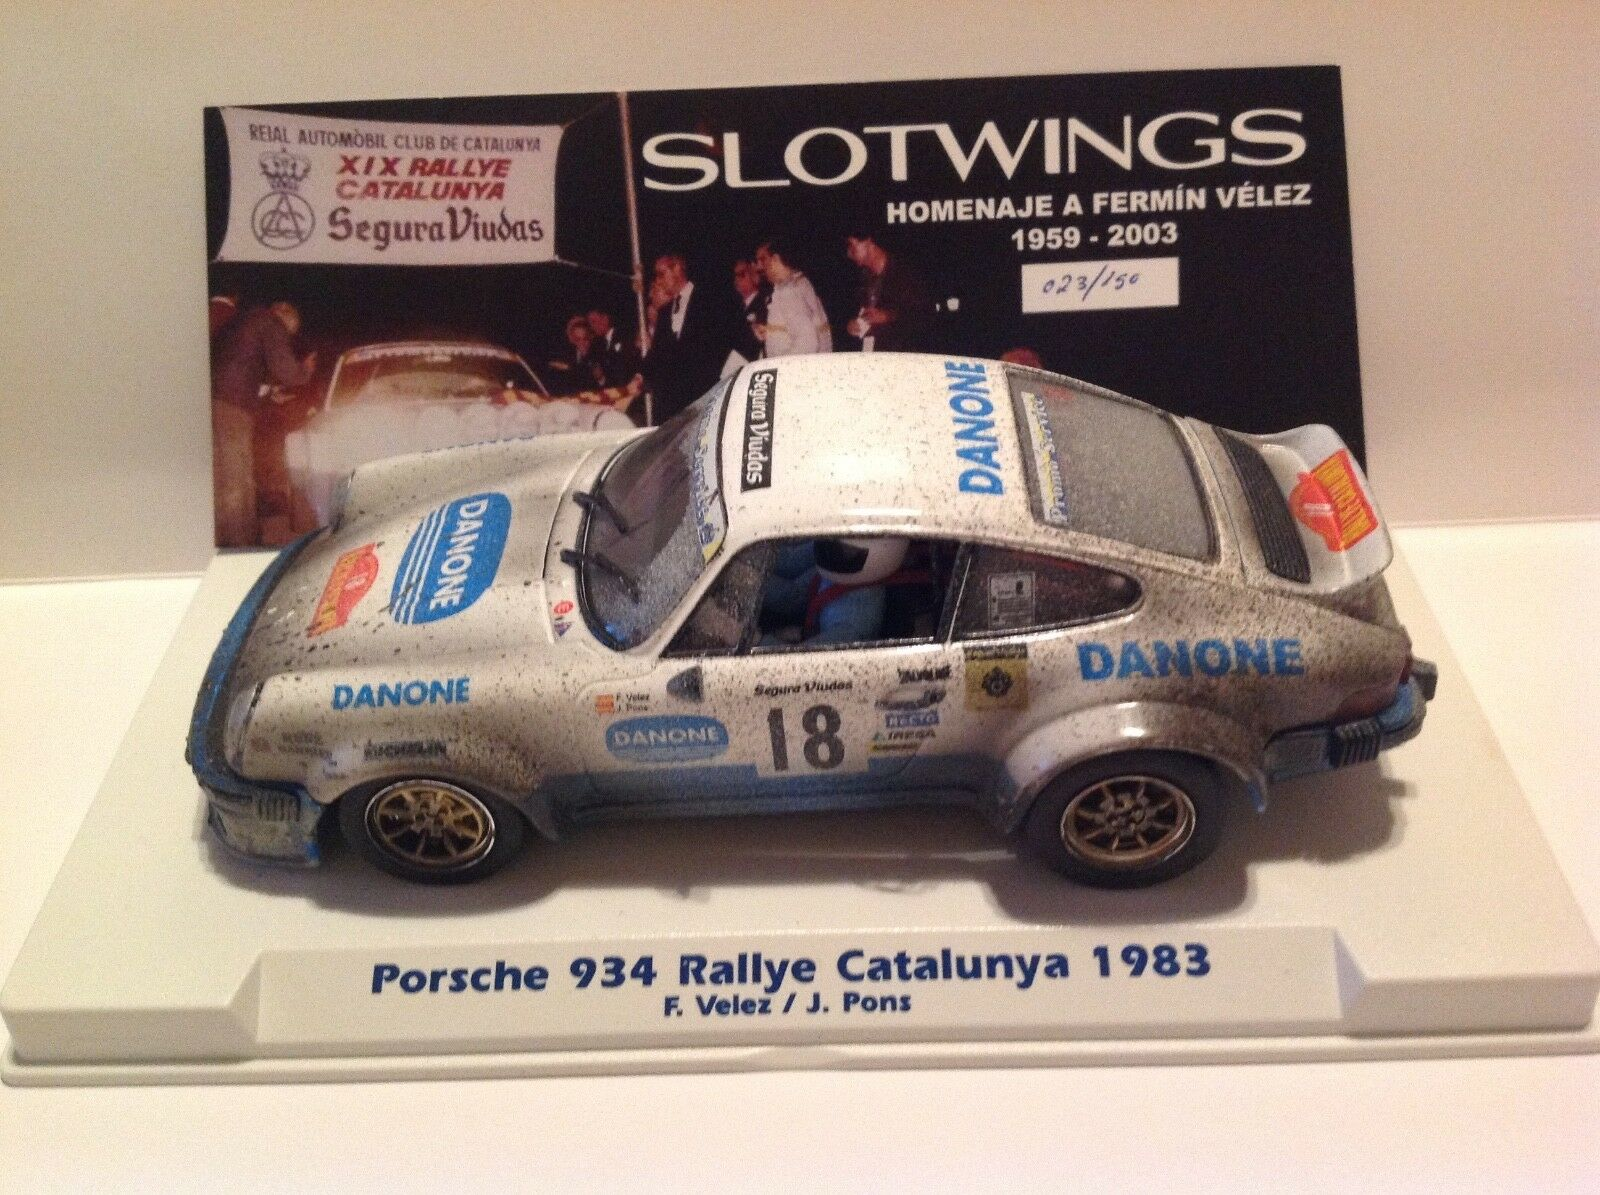 SLOTWINGS PORSCHE 934 Rallye Catalunya 1983 avec boue LTD. EDITION-NEUF